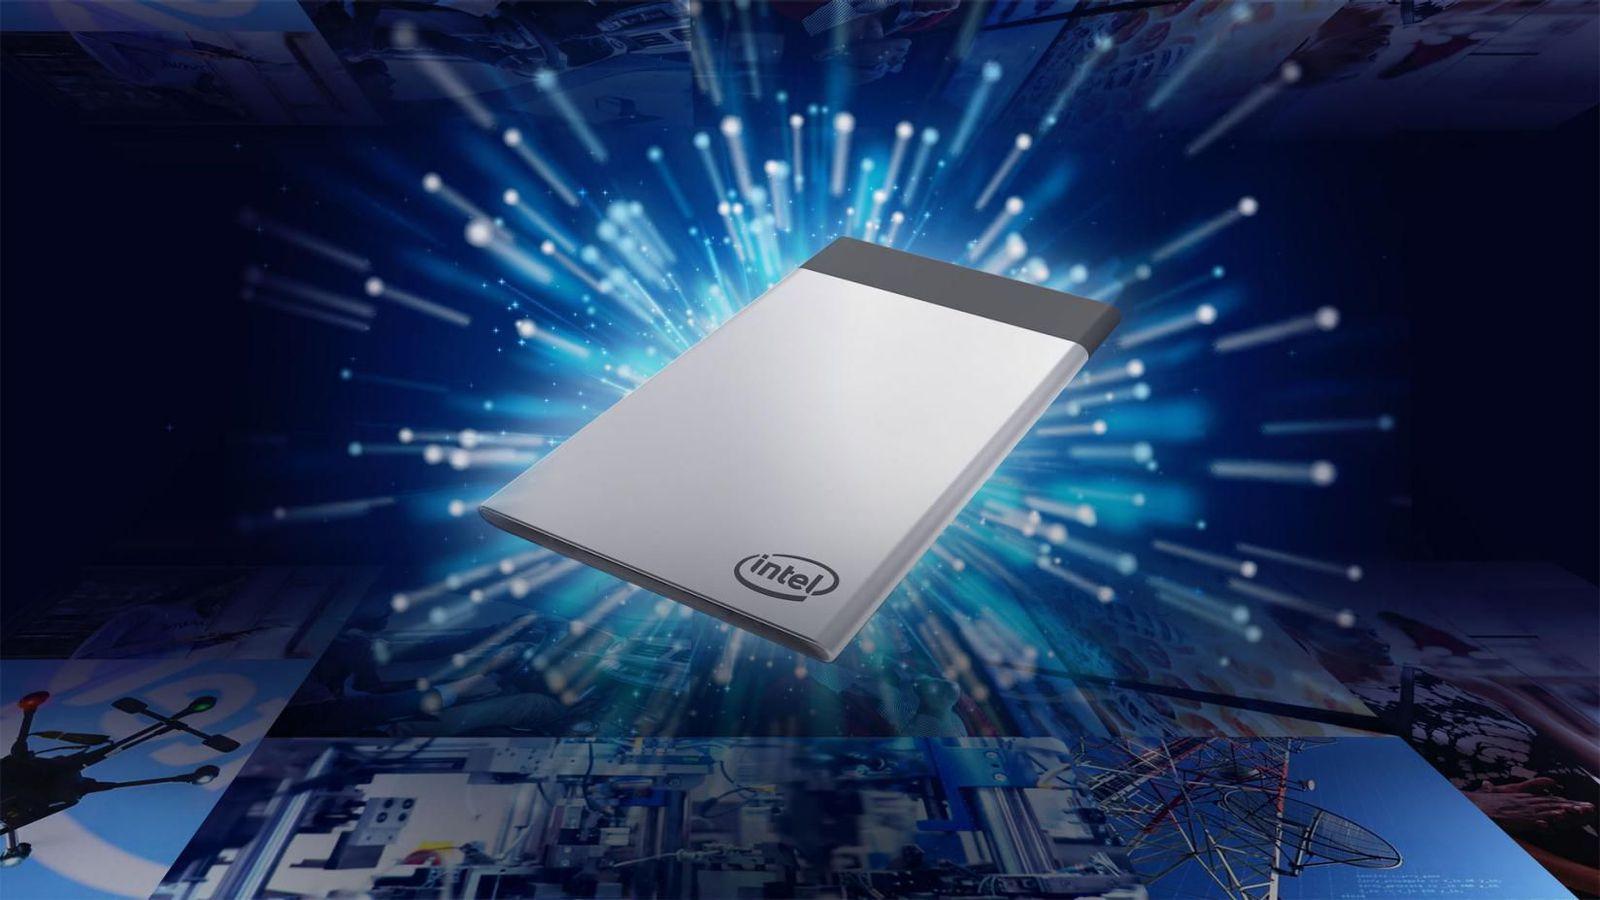 Intel Compute Card— компьютер размером скредитную карту